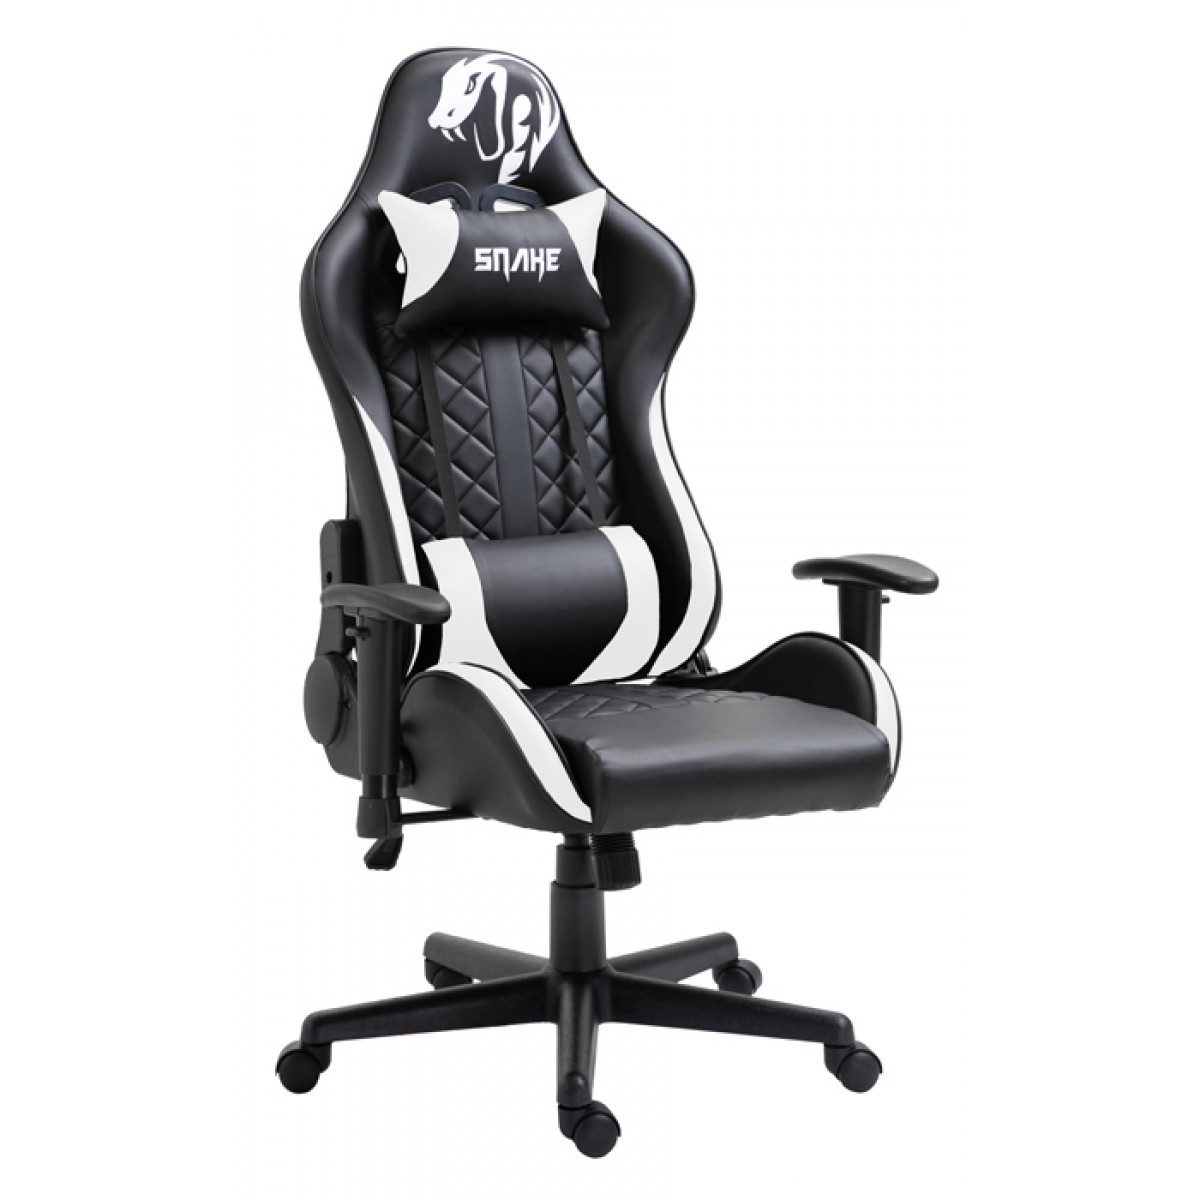 Cadeira Gamer Snake Mamba Negra 9183, Reclinável, Black-White